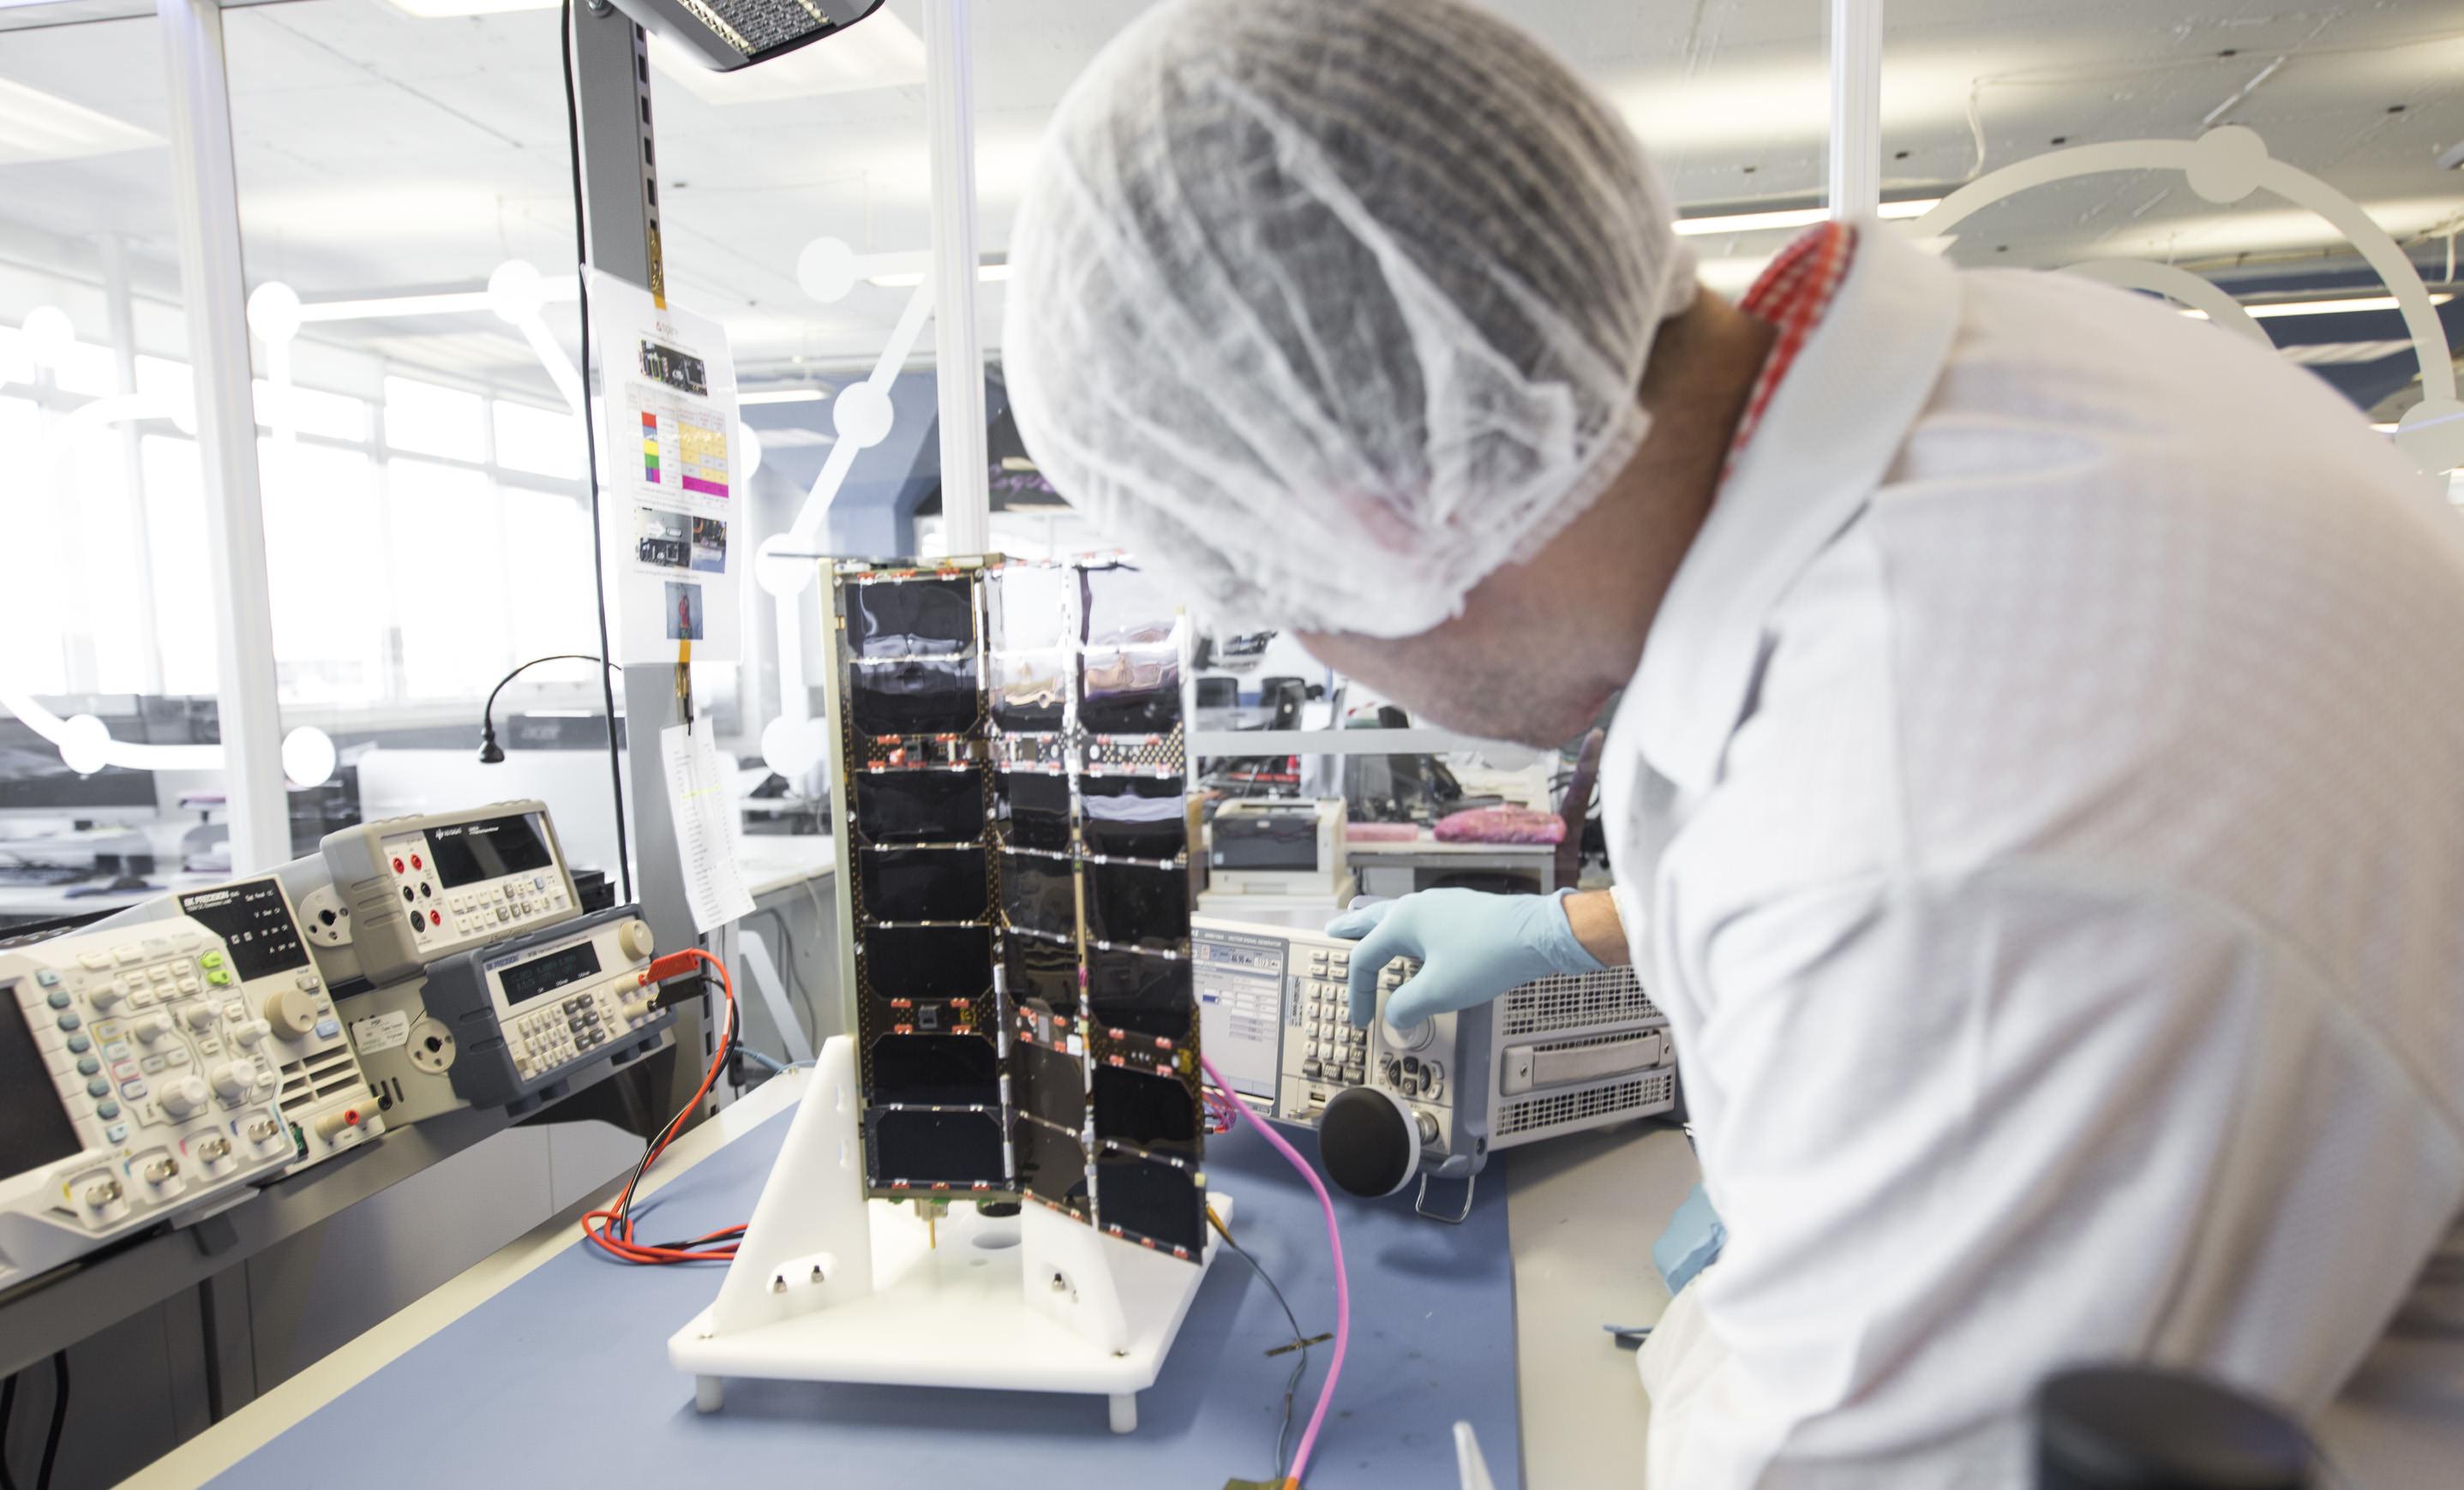 Spire nano satellite undergoing testing